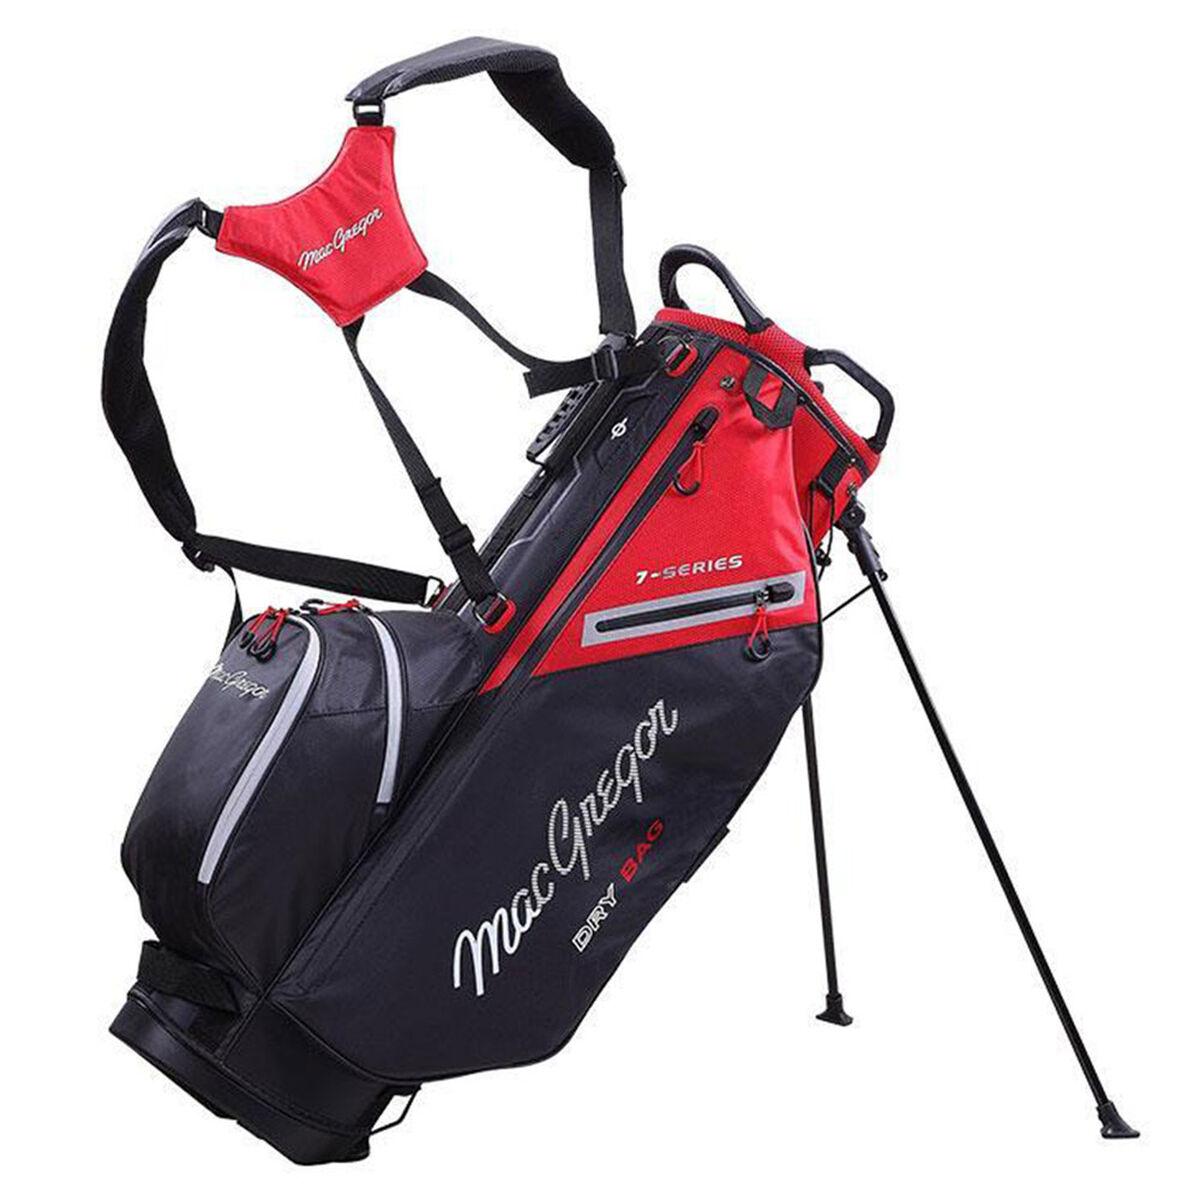 MacGregor 7-Series Water-Resistant Golf Stand Bag, Black red   American Golf